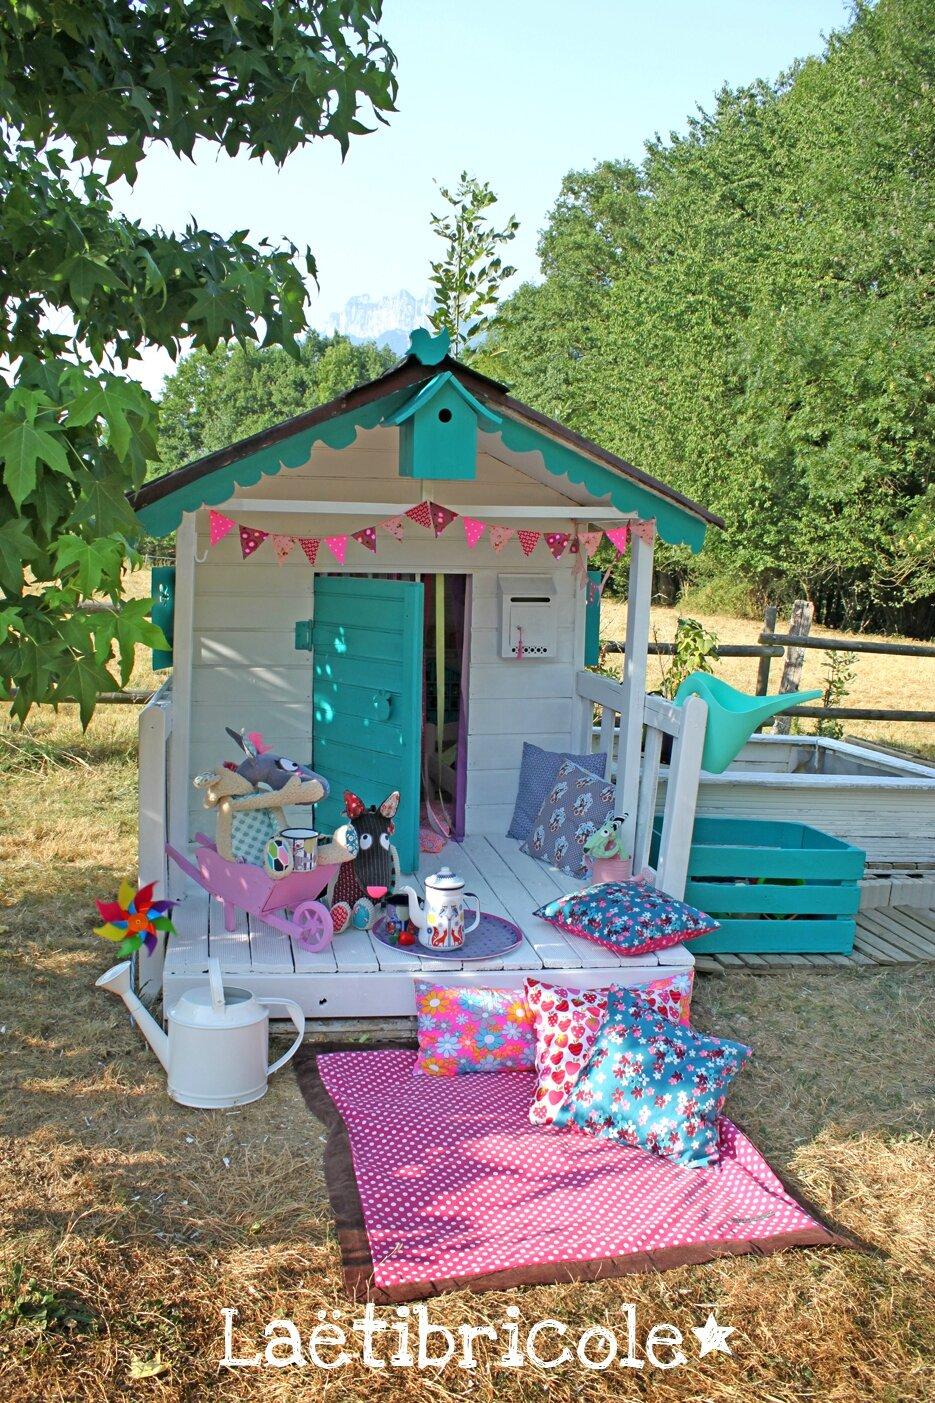 cabane et compagnie laetibricole. Black Bedroom Furniture Sets. Home Design Ideas